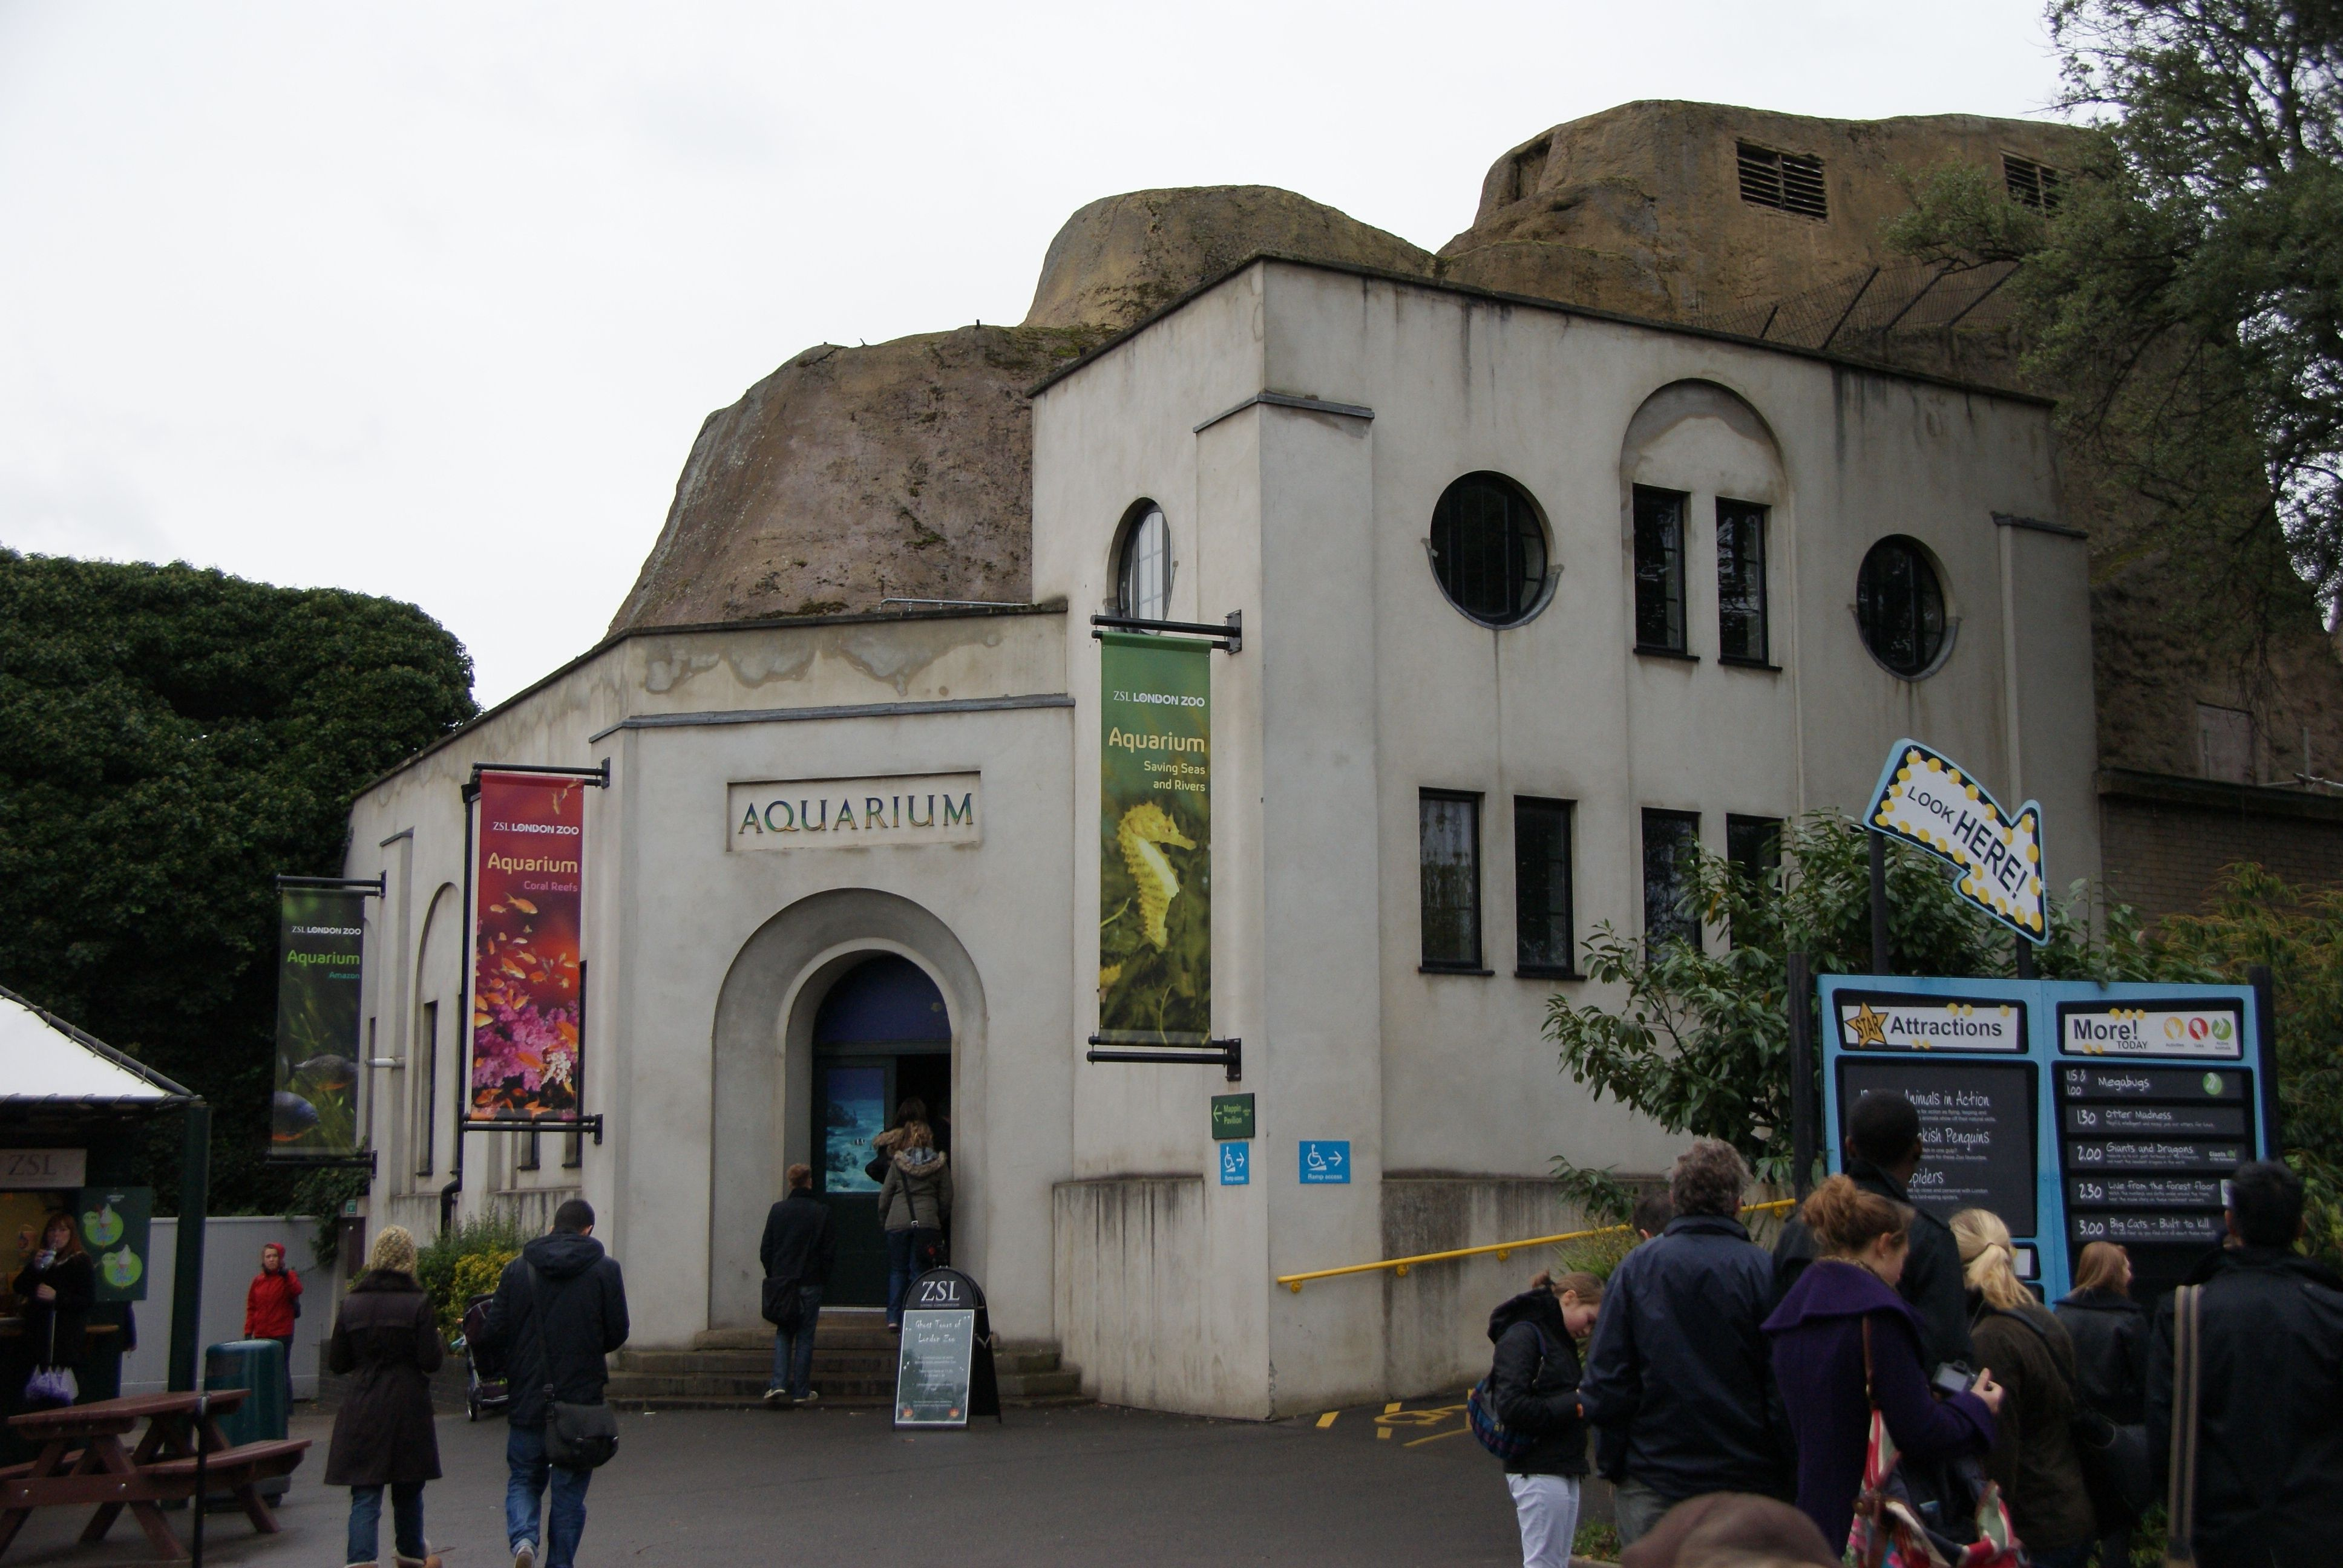 Buy fish for aquarium london - London Zoo Aquarium Chris Sampson Wikicommons